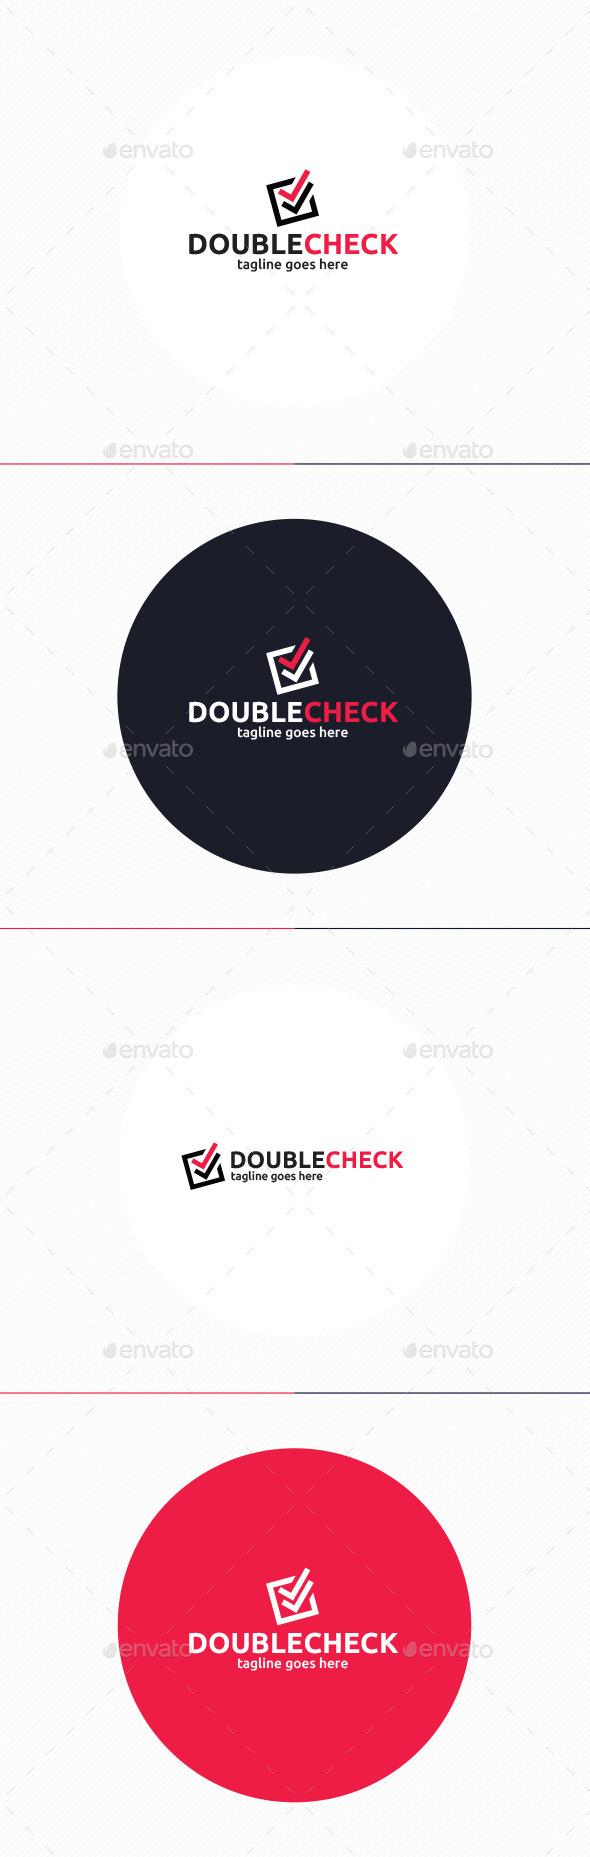 GraphicRiver Double Check Logo 10892631